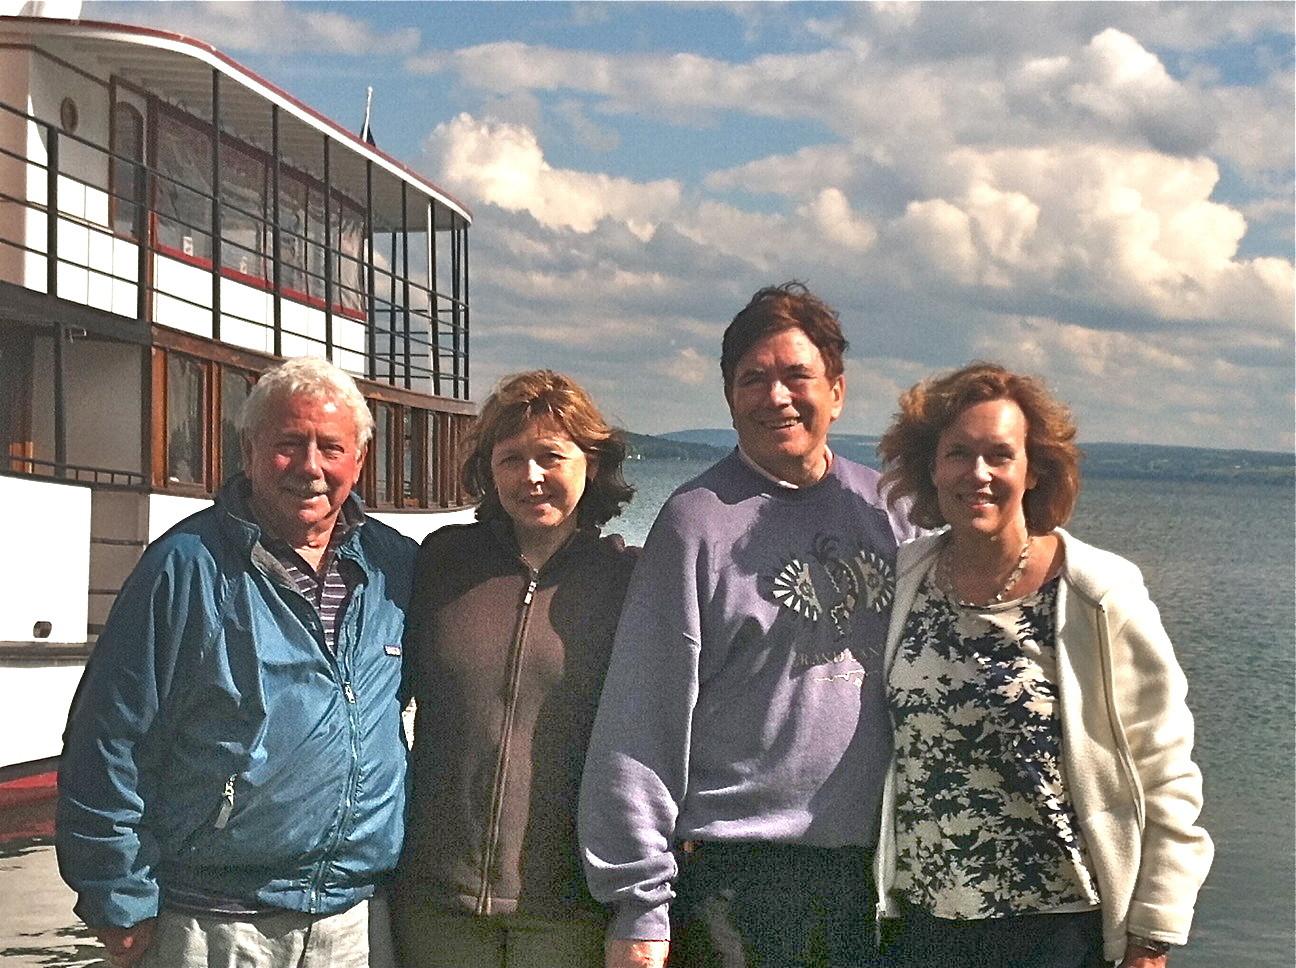 Don Fischman, Barbara Lohse, John Wagner, Lorraine Gudas, Skaneateles, NY August, 2014